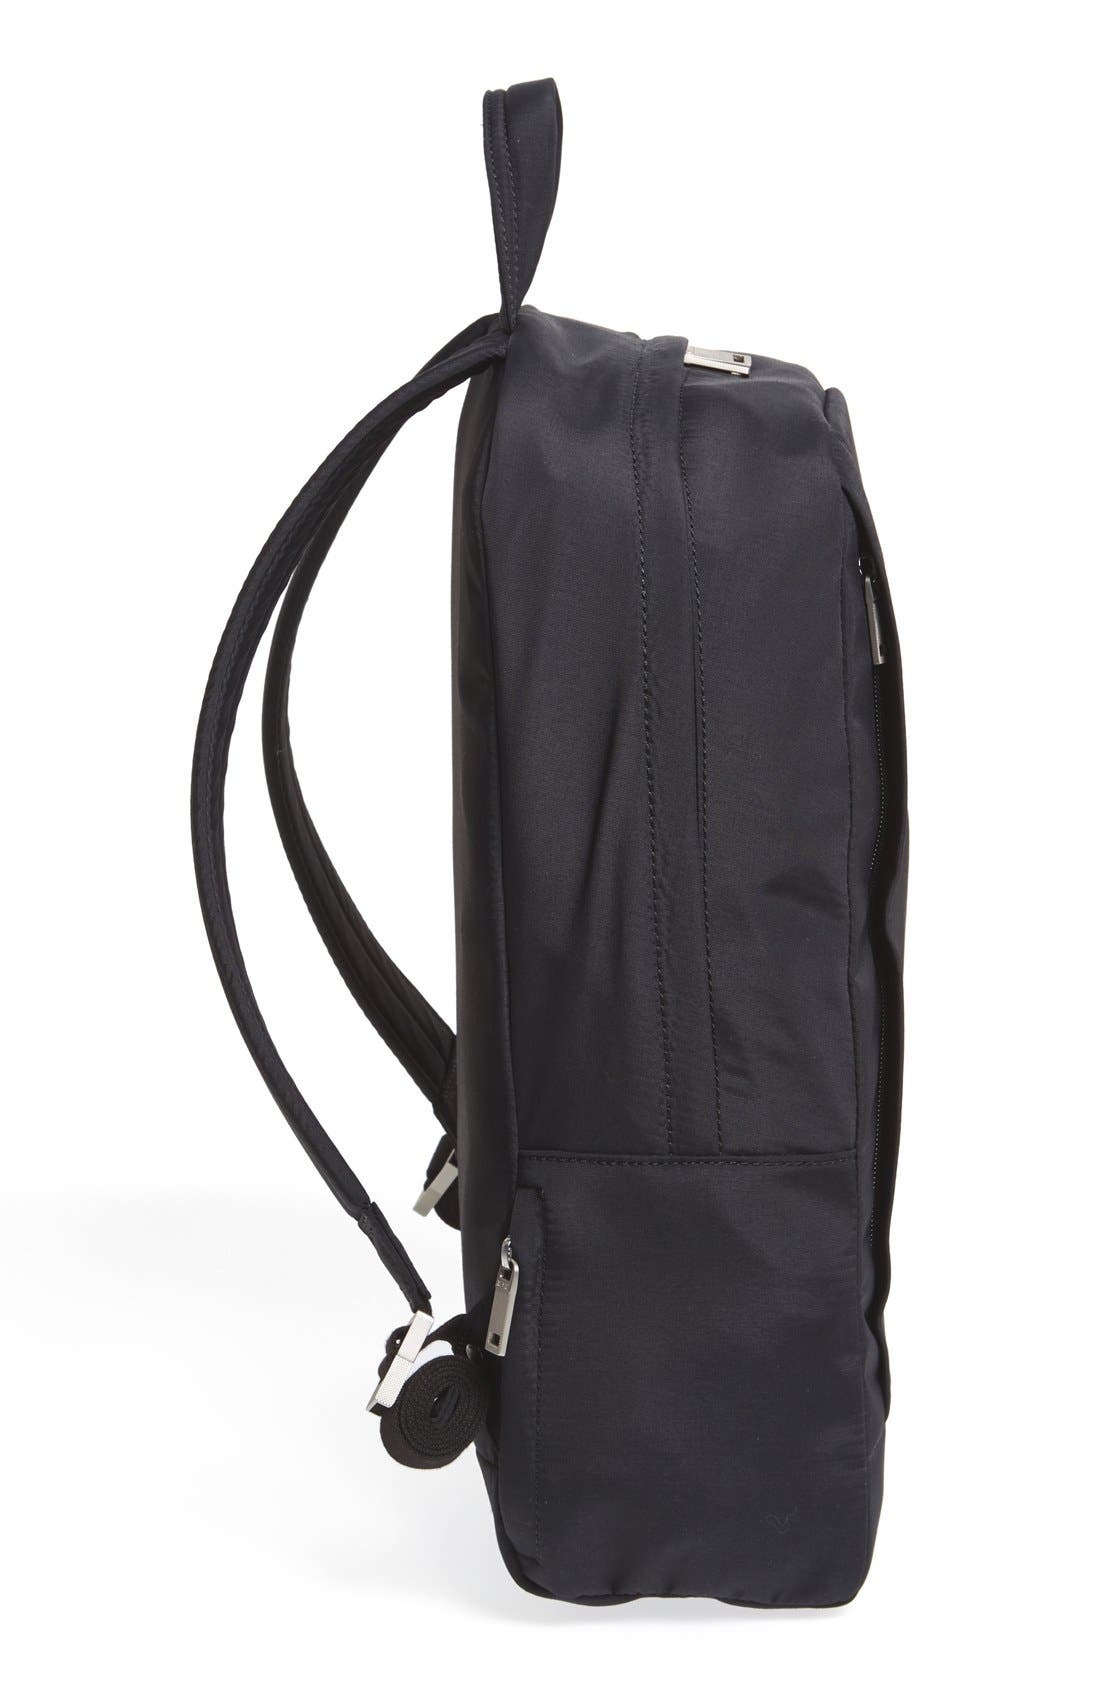 JACK SPADE,                             'Tech' Nylon Backpack,                             Alternate thumbnail 6, color,                             001